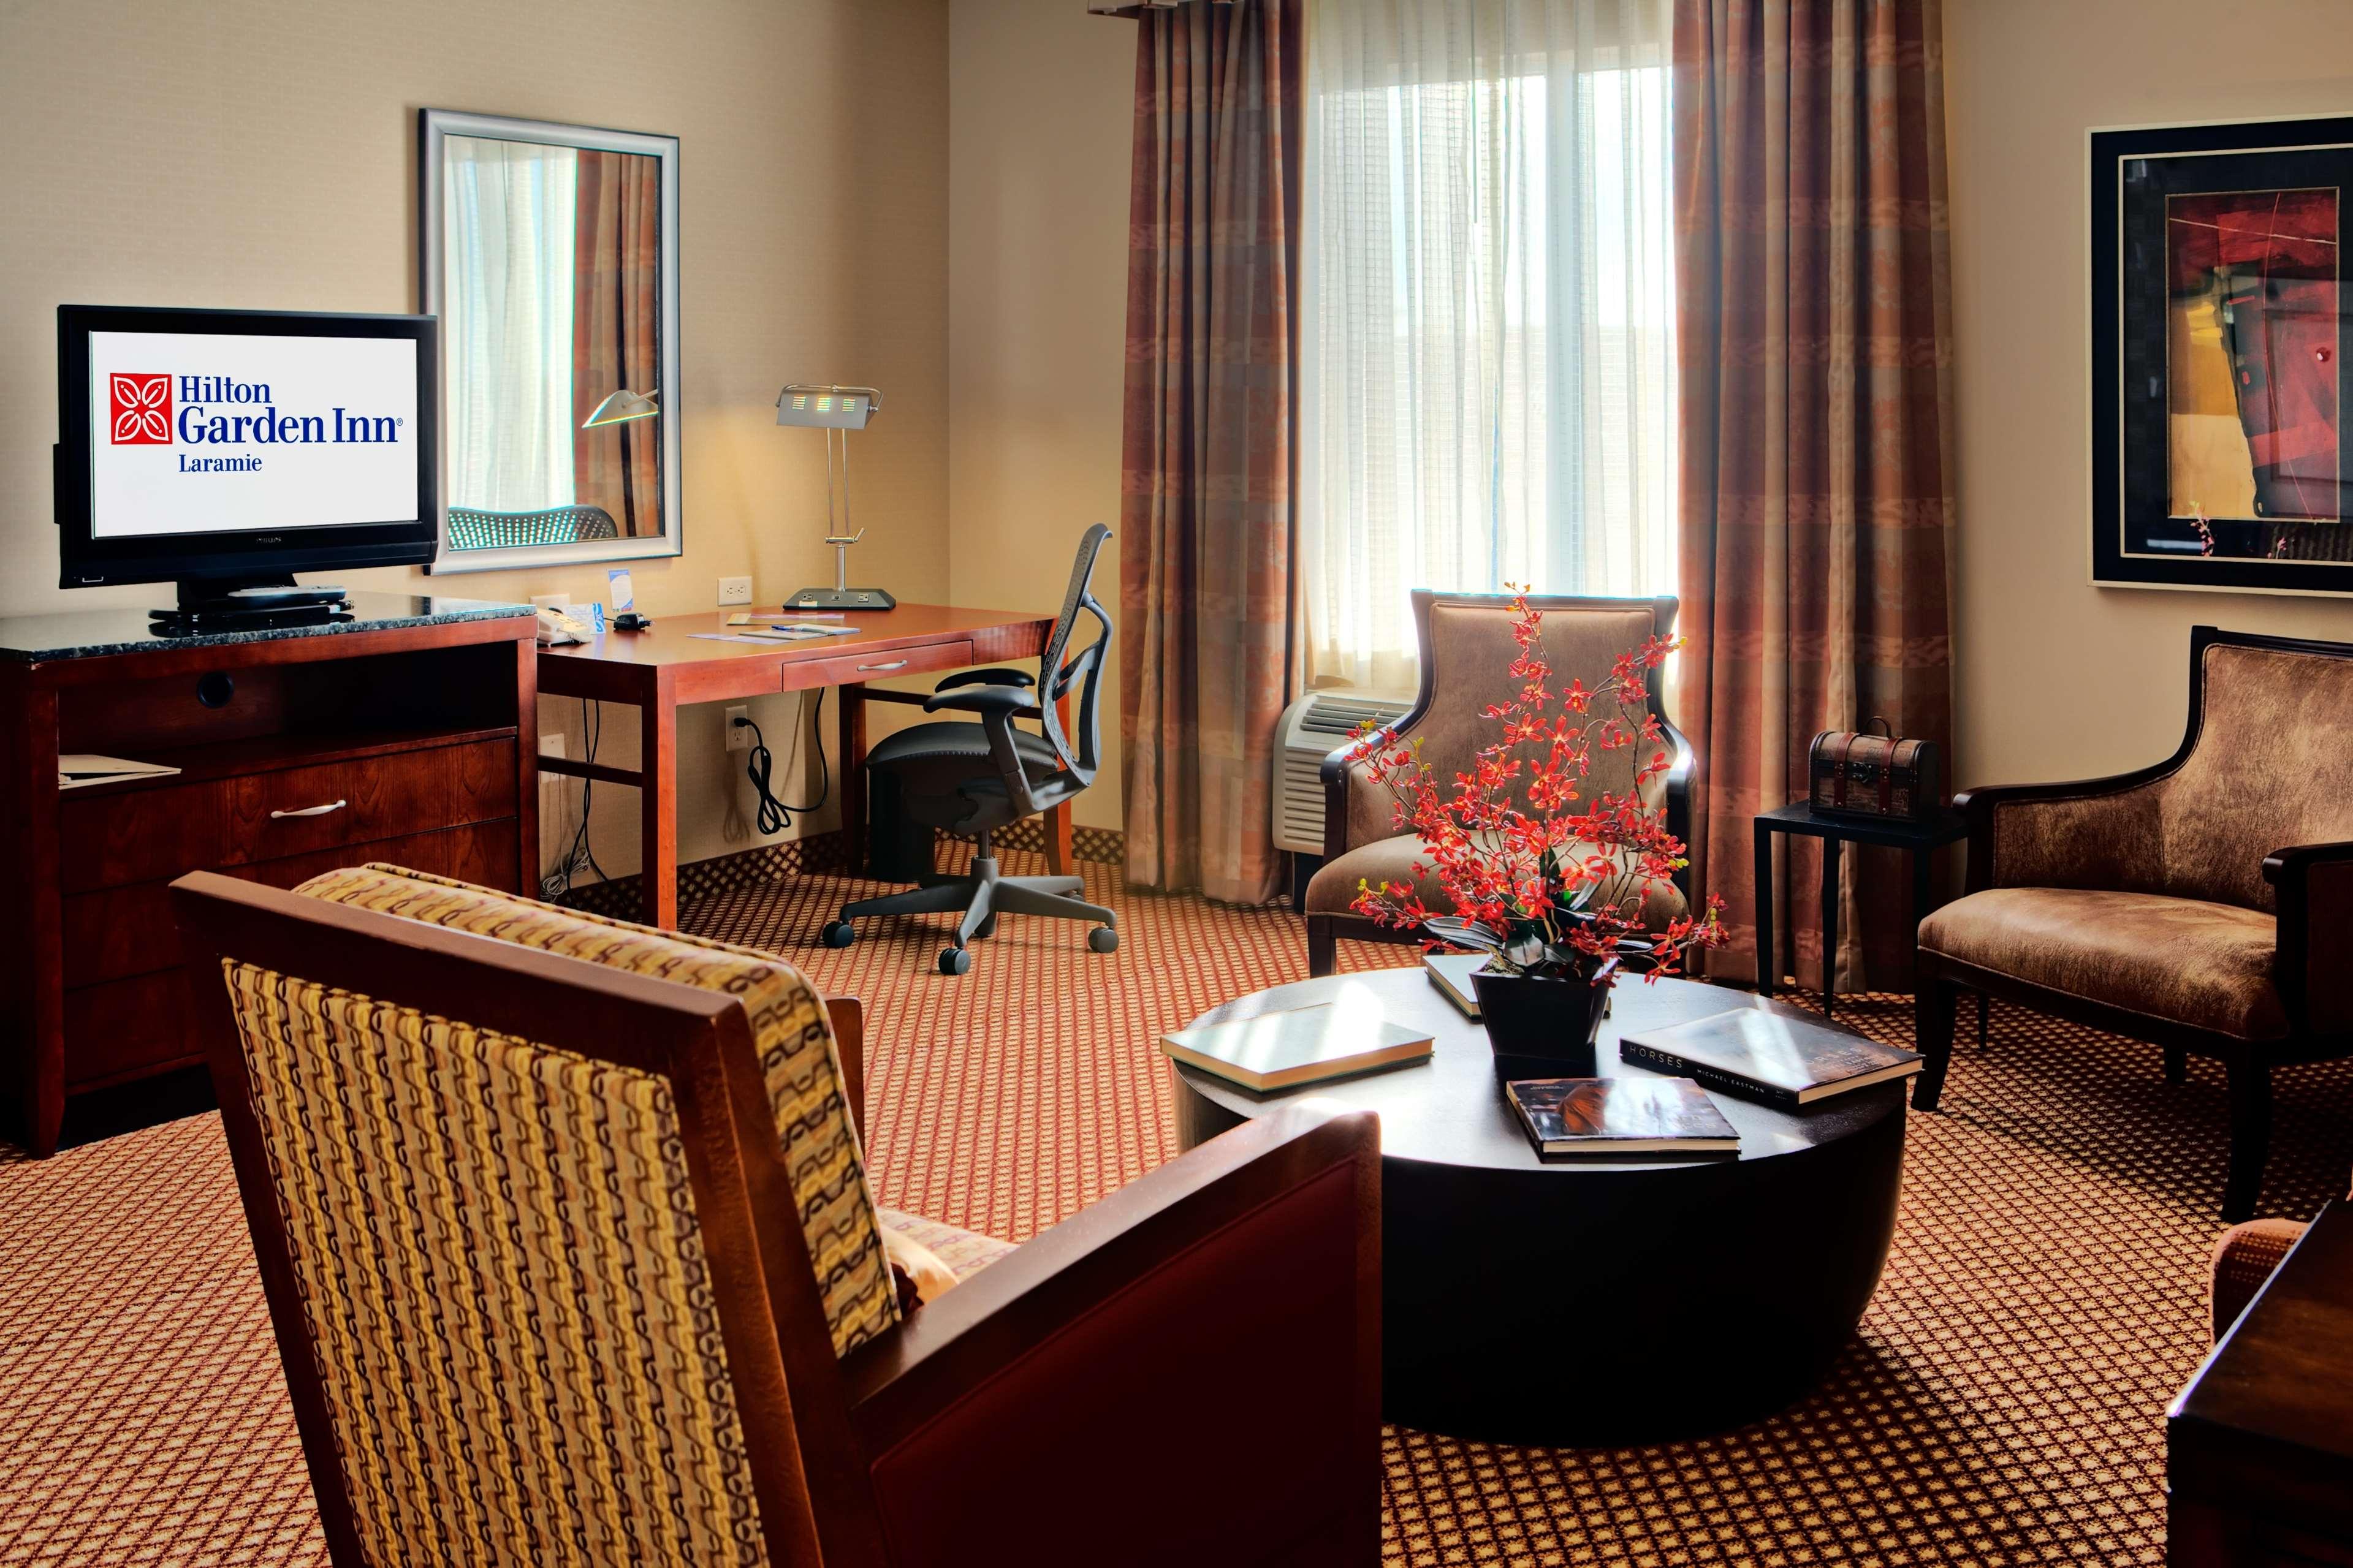 Hilton Garden Inn Laramie image 28